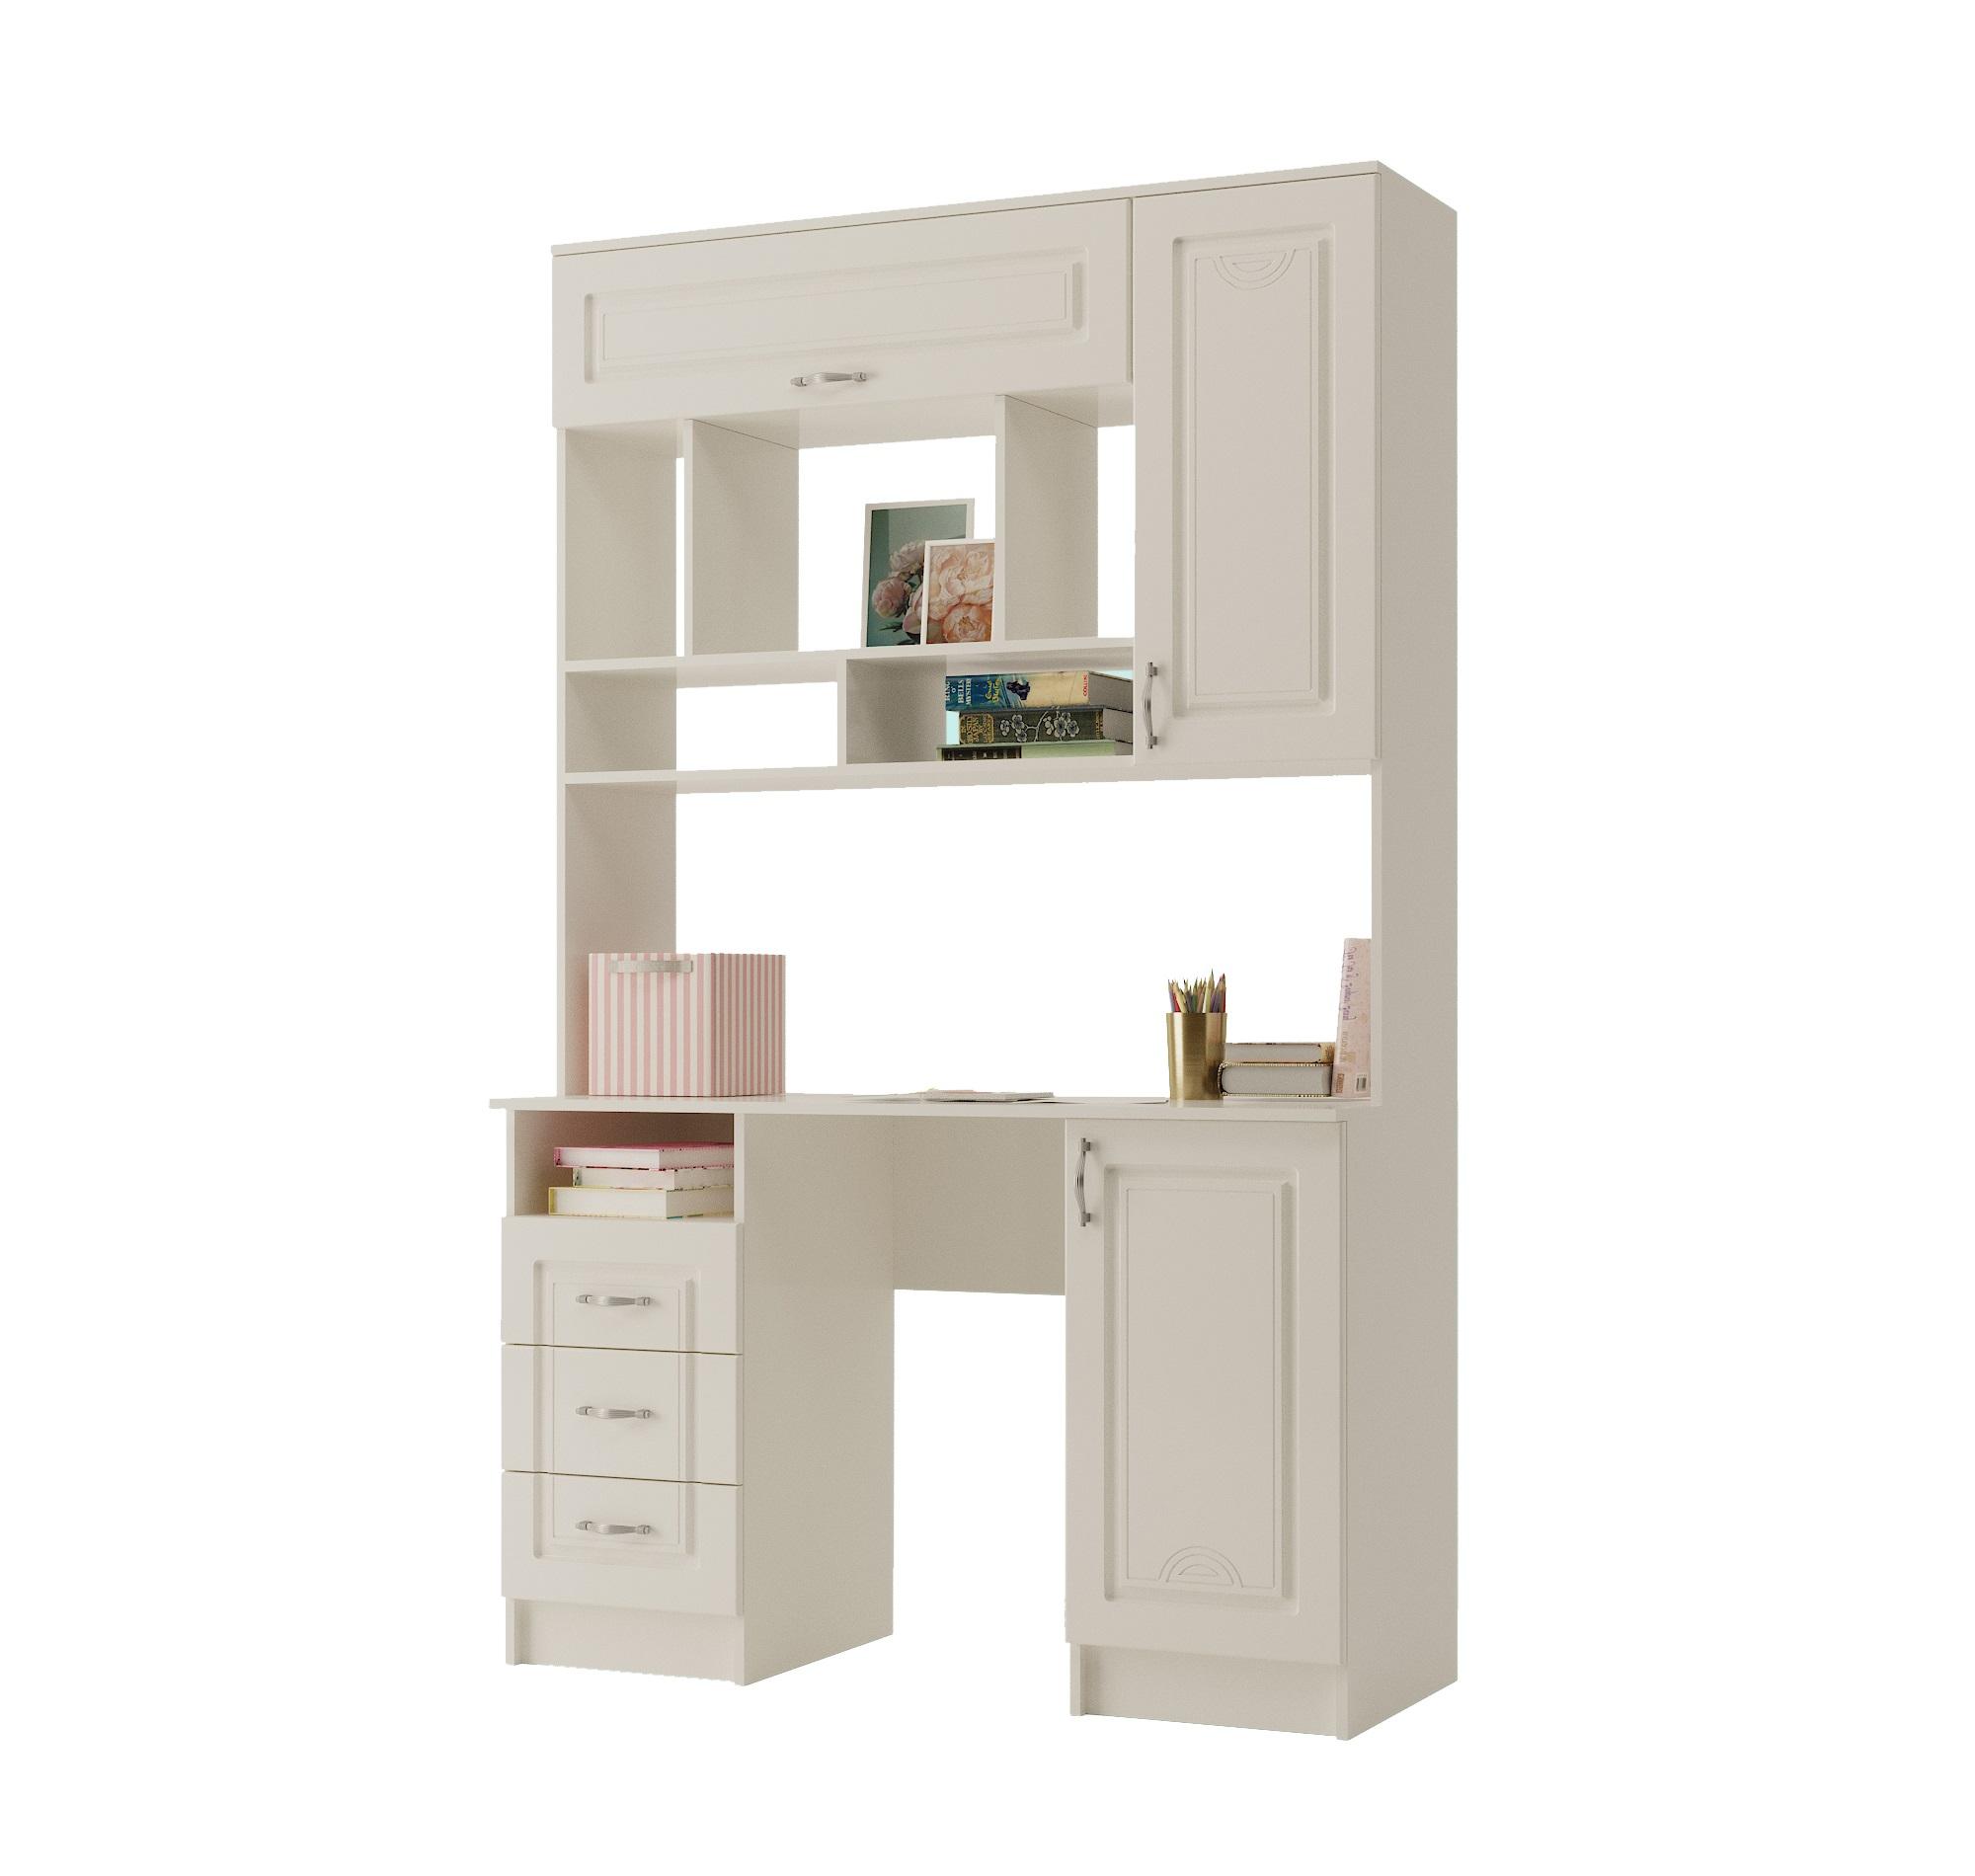 Продажа мебели в интернет-магазине ВашаКомната.РФ – фото 1.28